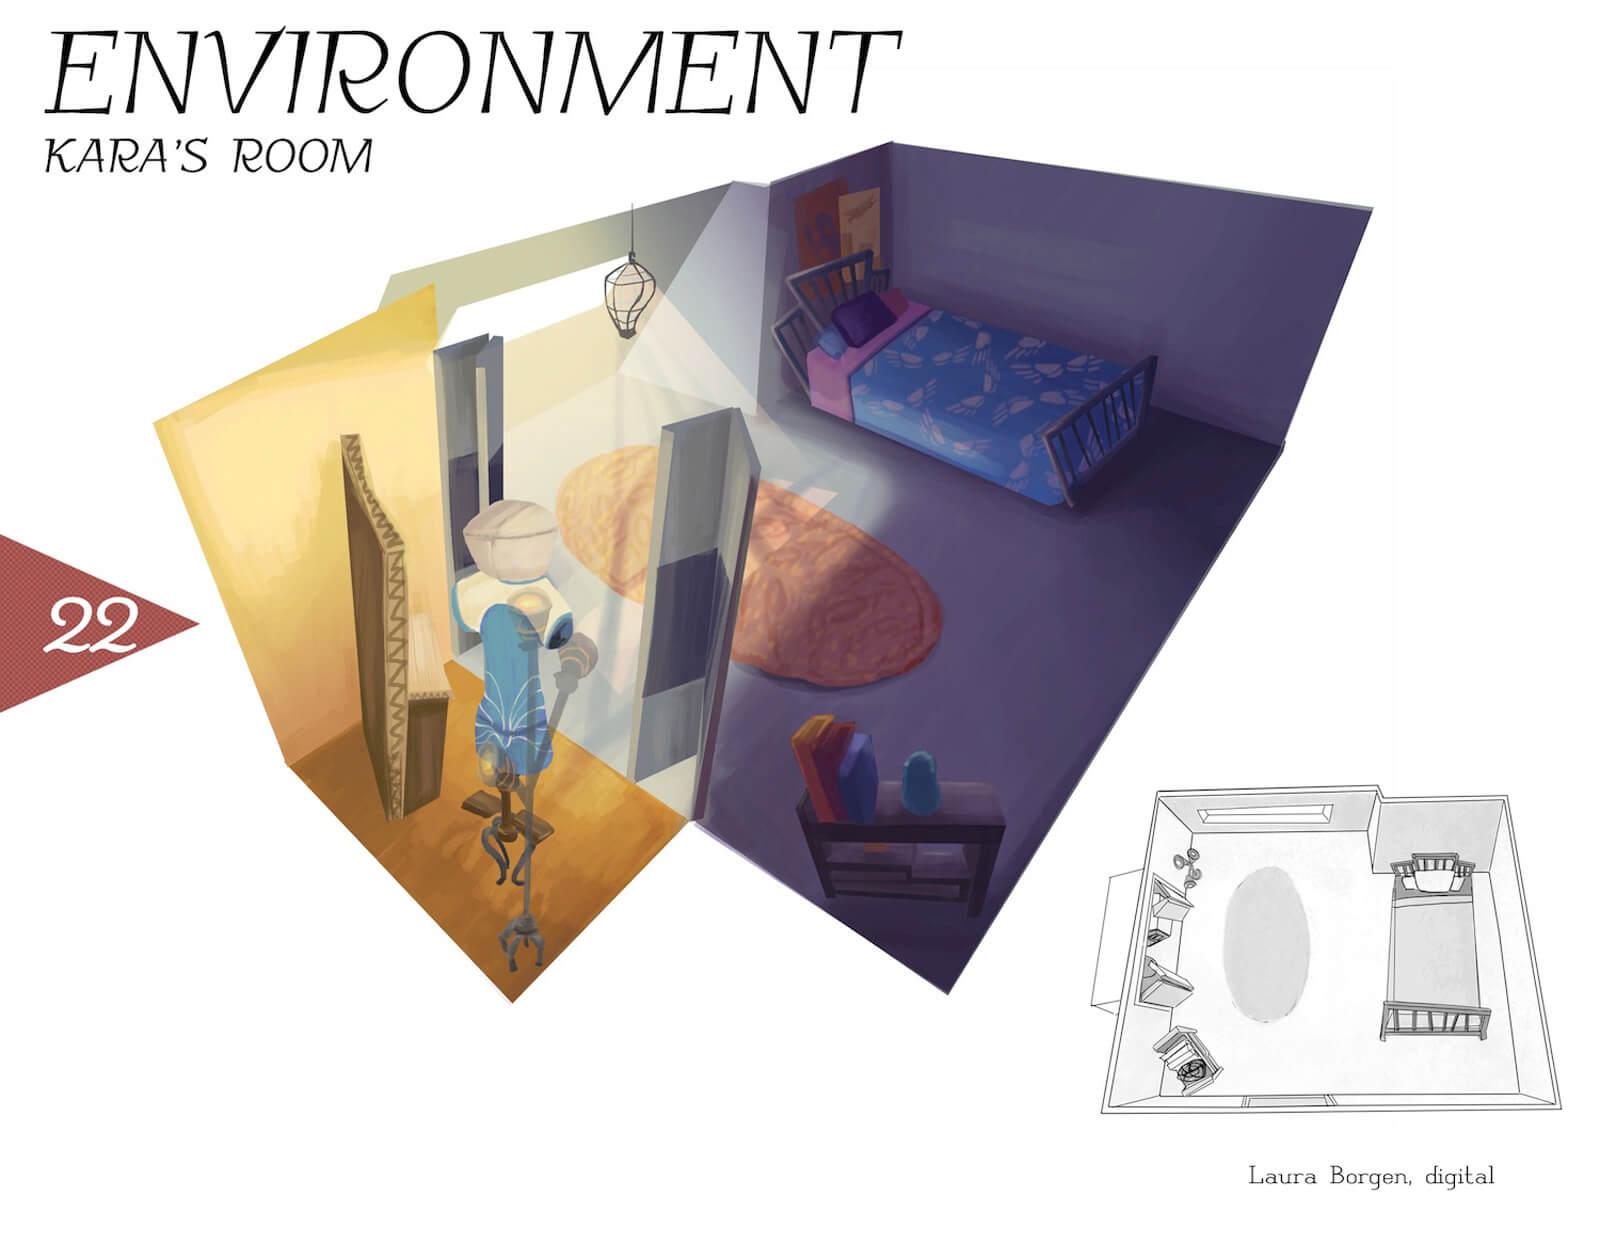 Artwork depicting Kara's room in the film Super Secret, including a bed, rug, closet, and skylight